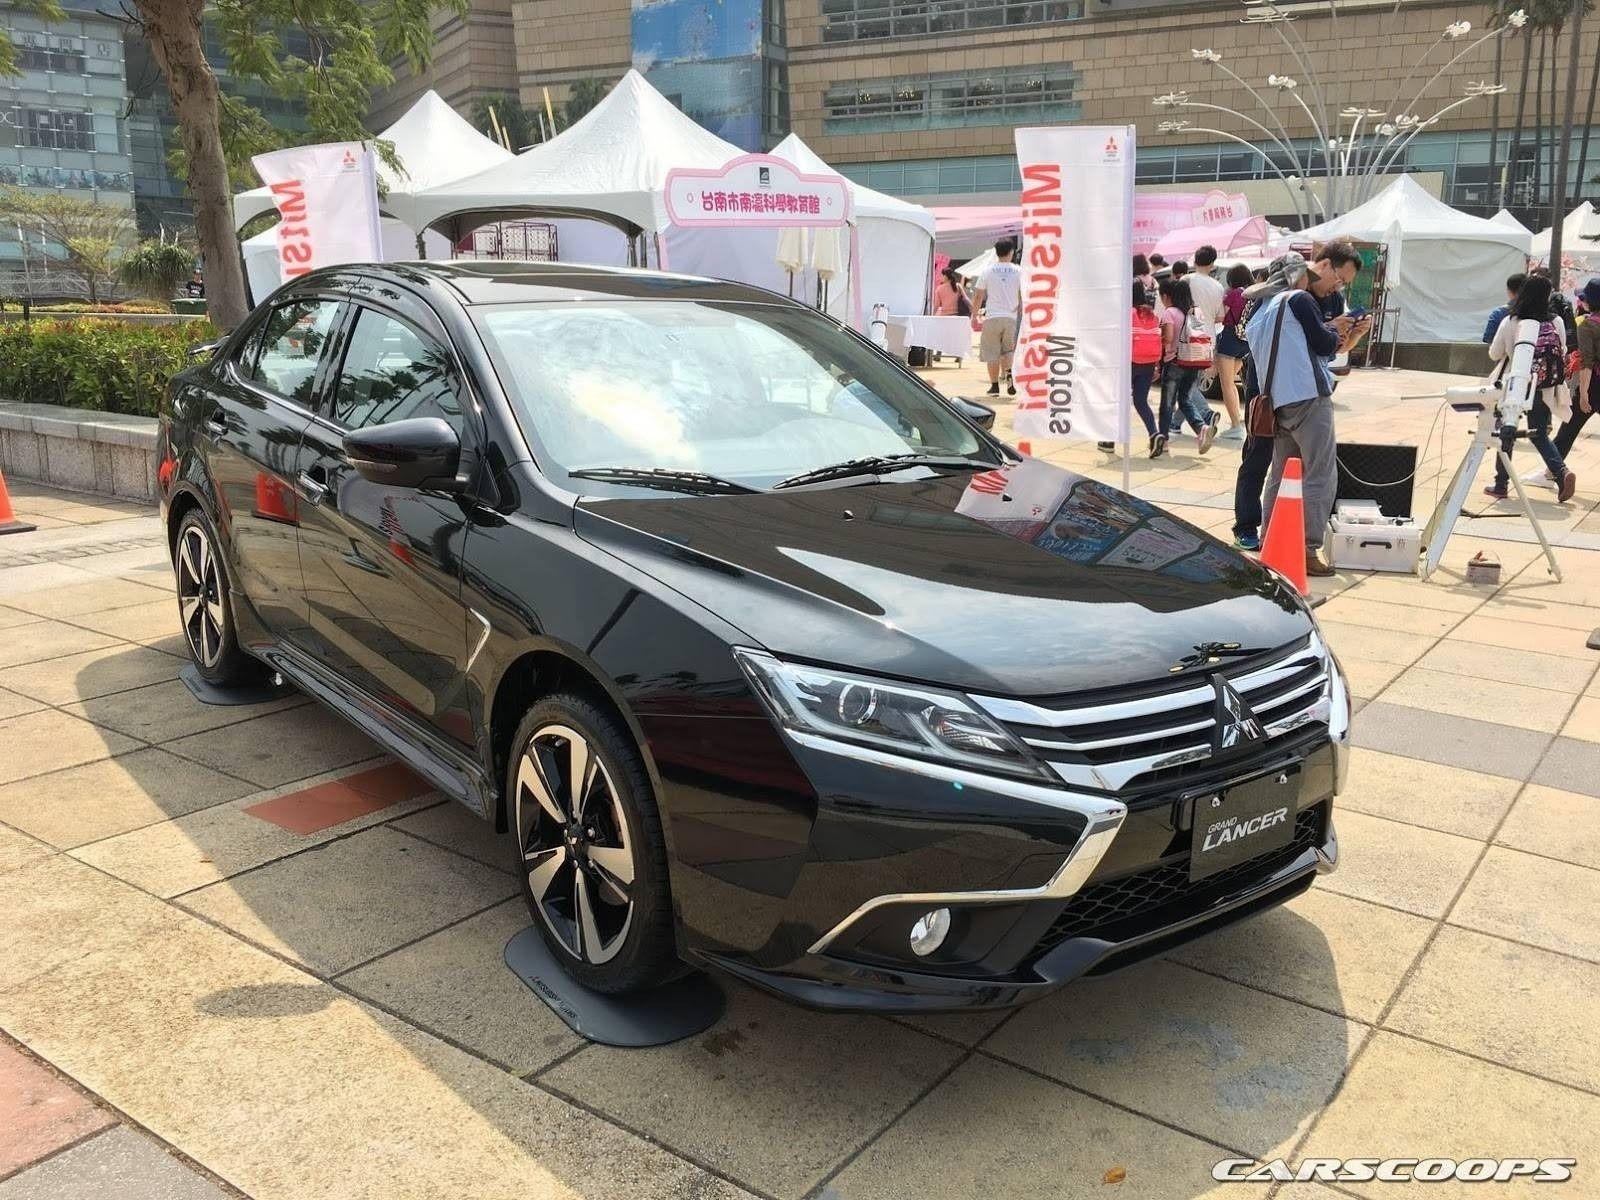 New 2019 Mitsubishi Galant Specs